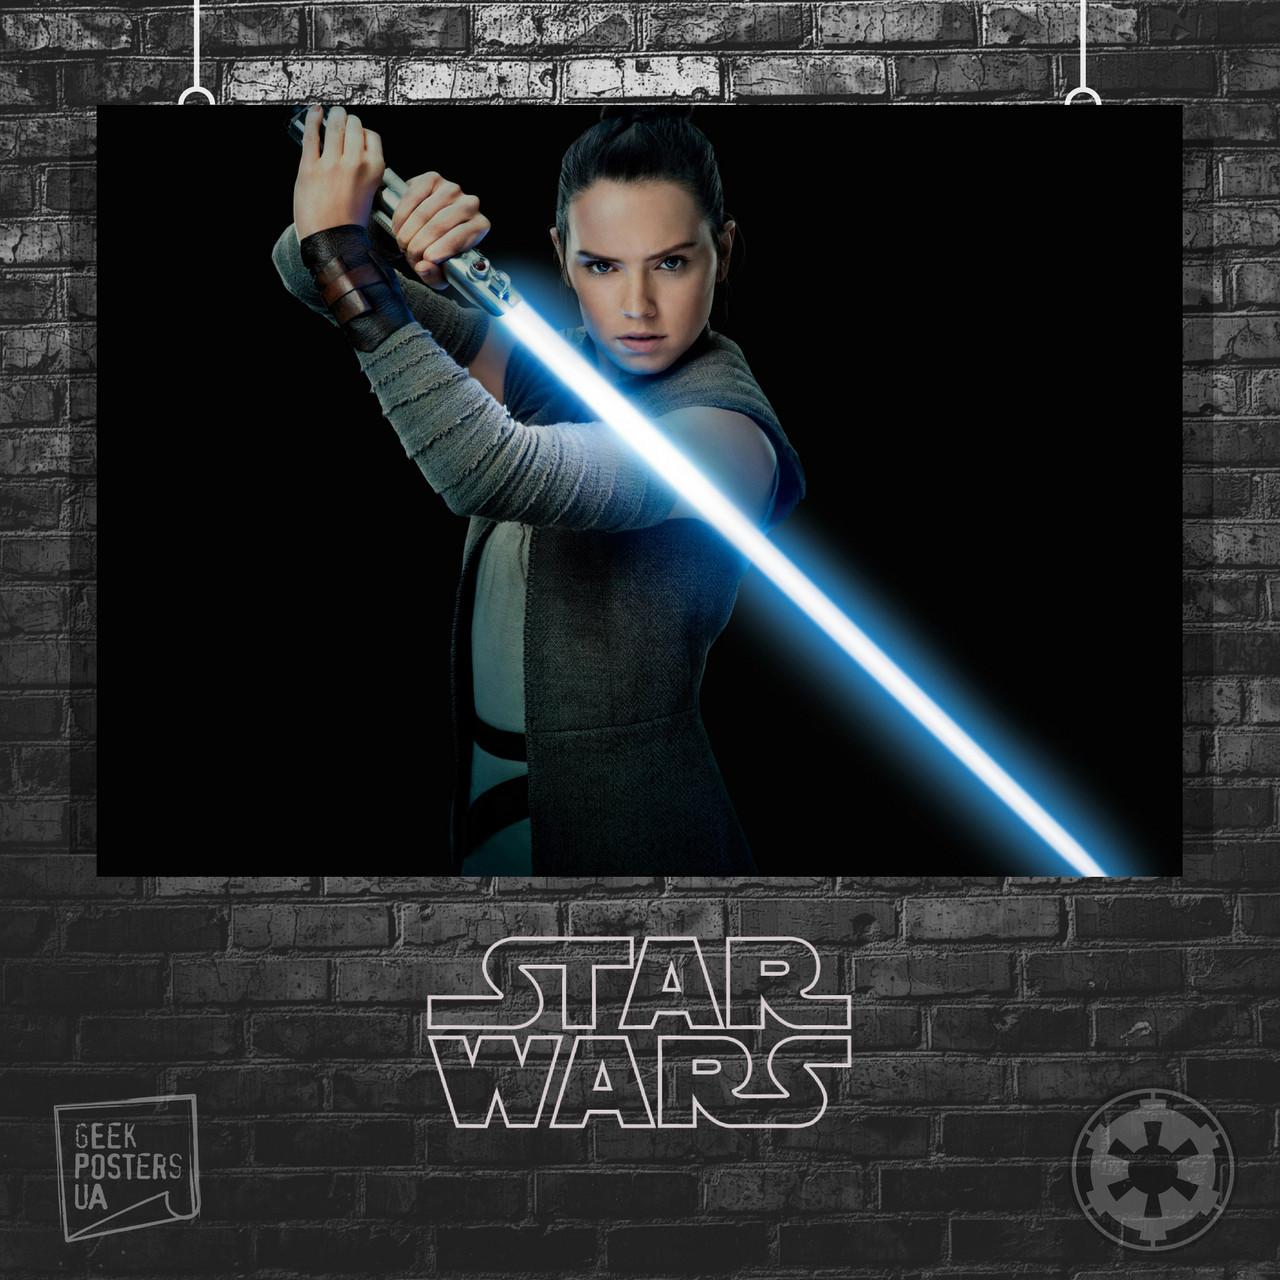 Постер Star Wars: Last Jedi (Рей с мечом на чёрном фоне). Размер 60x42см (A2). Глянцевая бумага